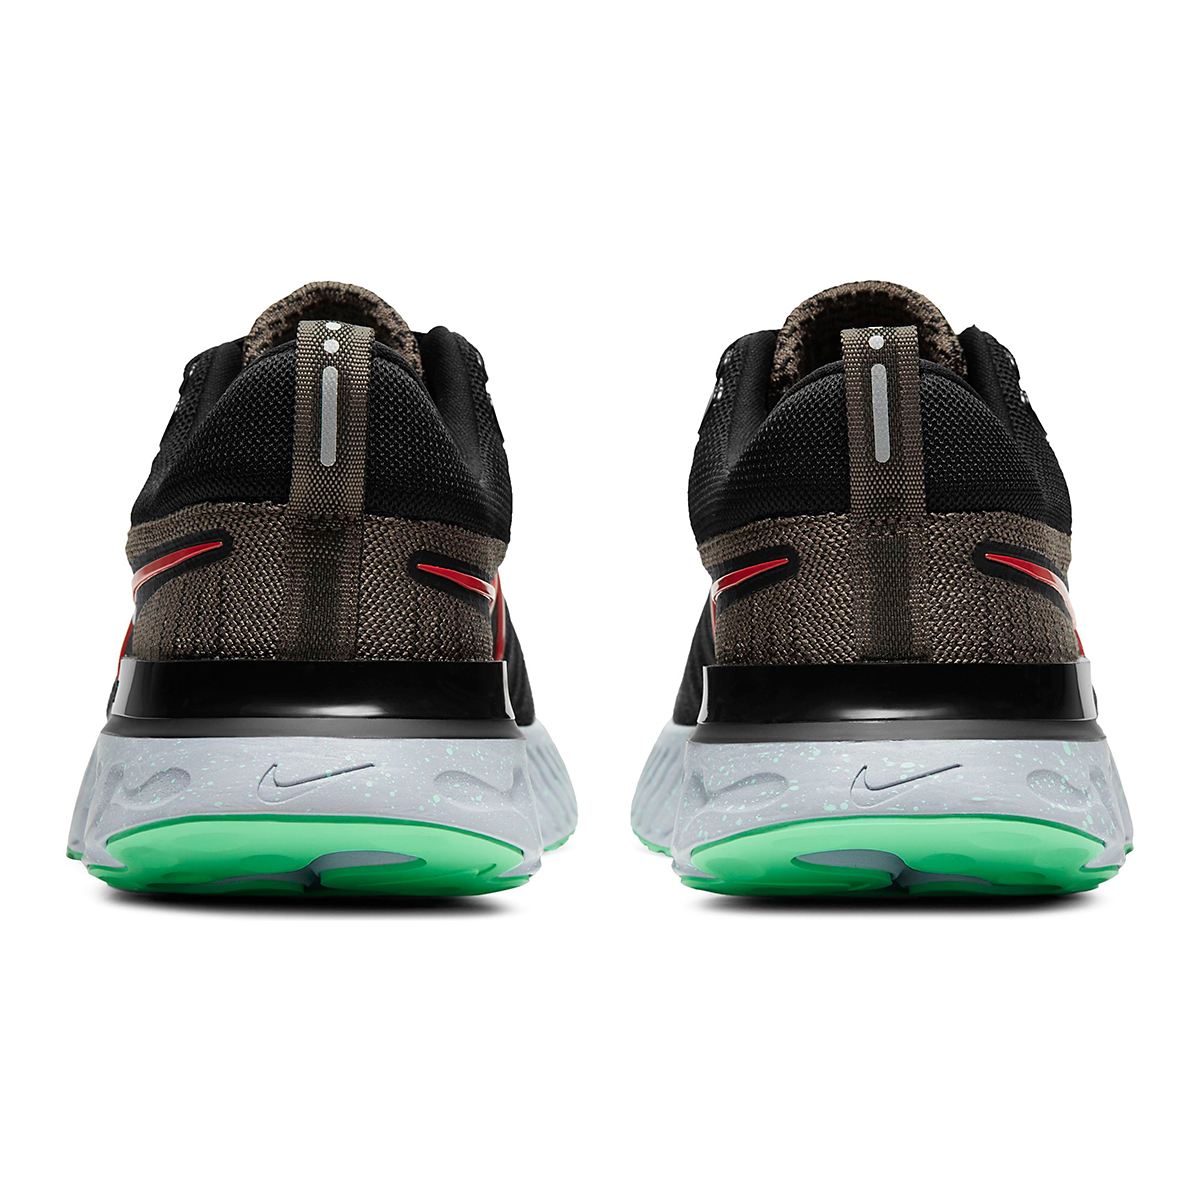 Men's Nike React Infinity Run Flyknit 2 Running Shoe - Color: Ridgerock/Chile Red/Black/Green Glow - Size: 6 - Width: Regular, Ridgerock/Chile Red/Black/Green Glow, large, image 5